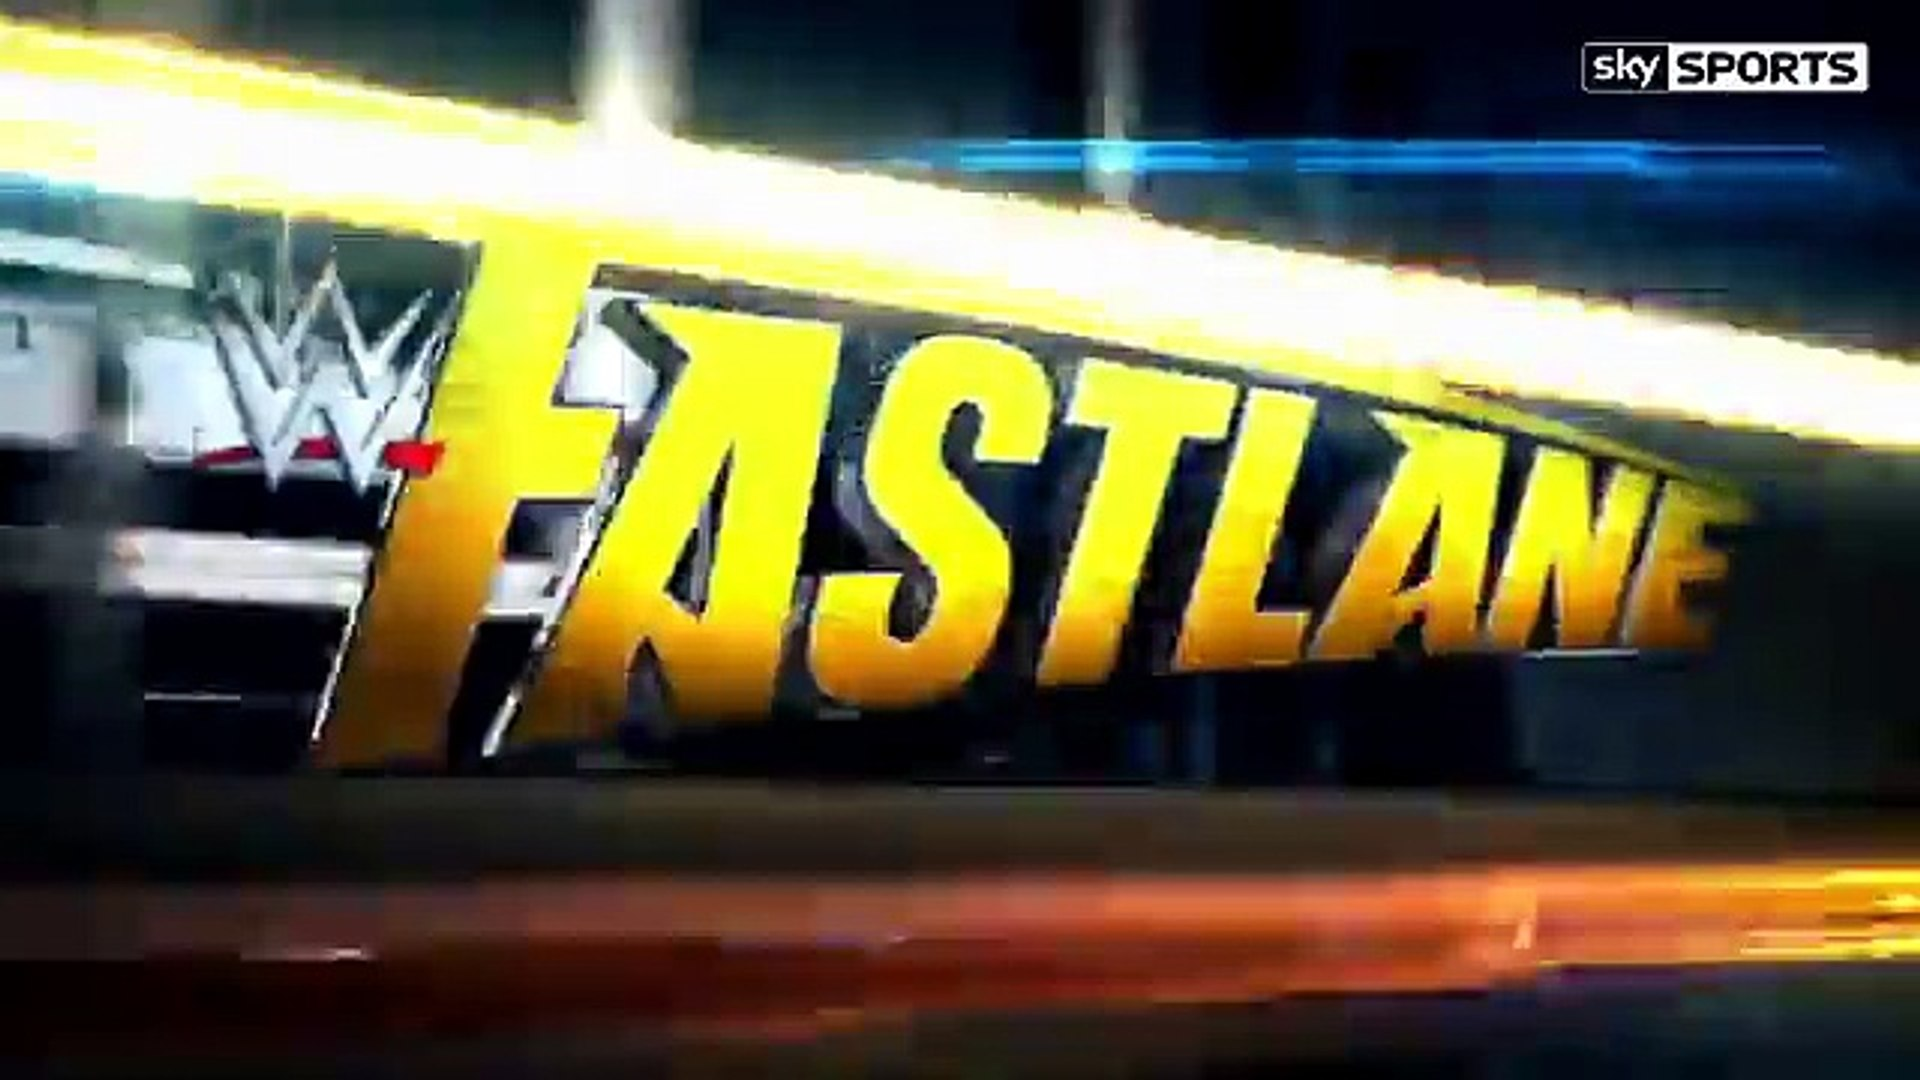 WWE Fastlane_ Delzinski makes 2K17 predictions for Sunday's PPV _ WWE News _ Sky Sports